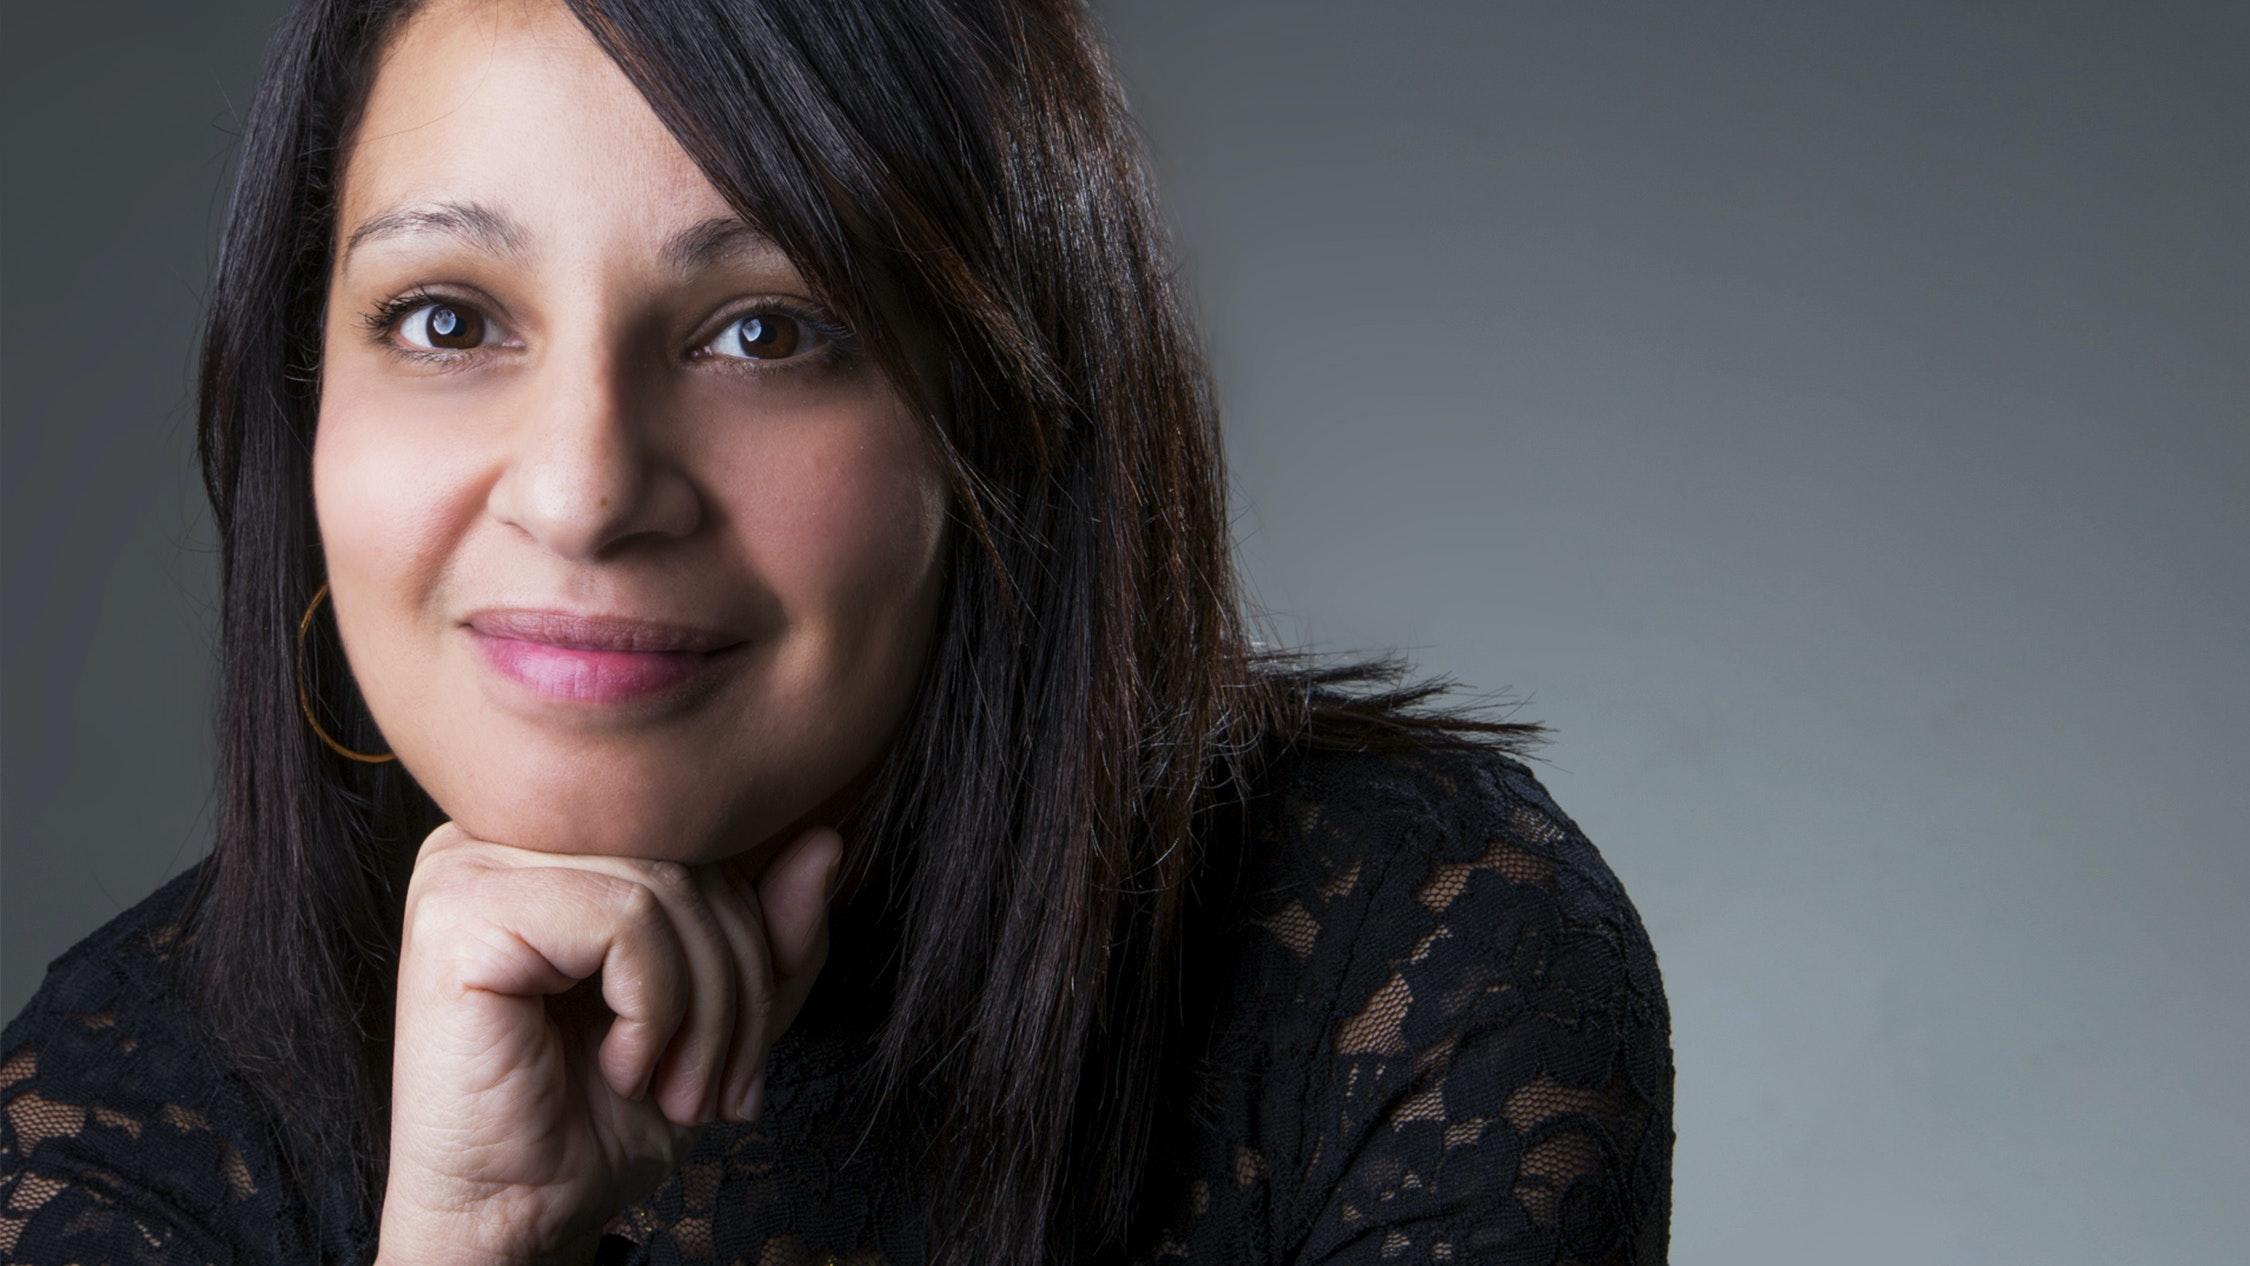 Dr. Mona Gohara